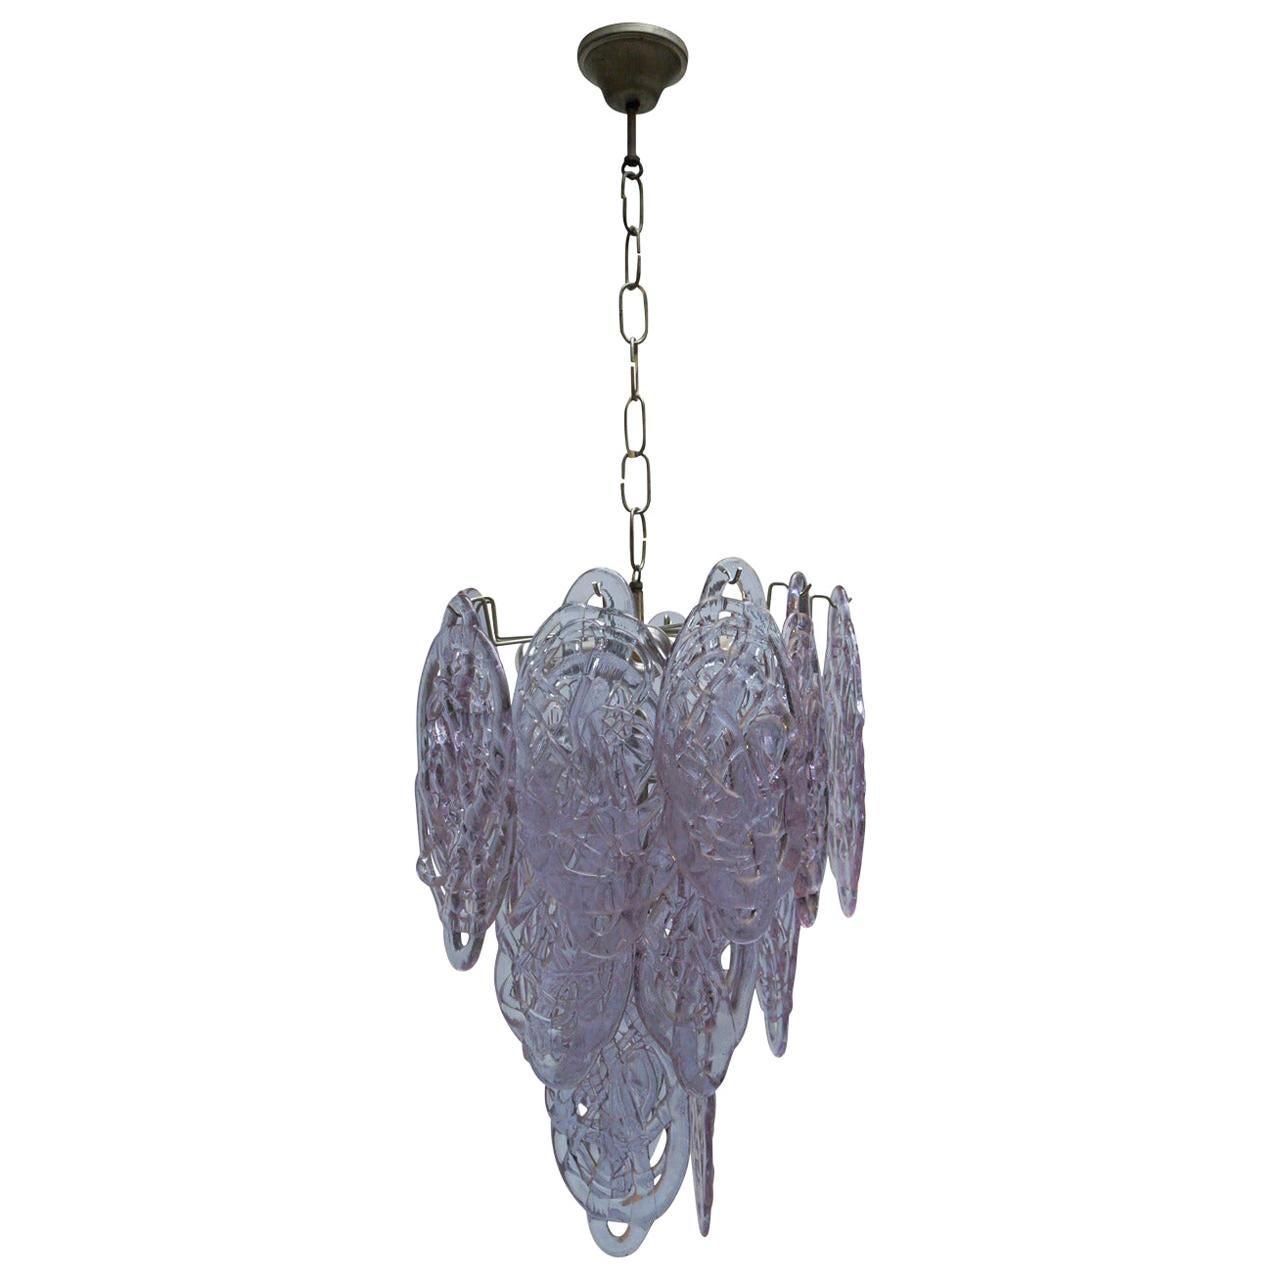 Stunning Murano Glass Chandelier by Carlo Nason for Mazzega